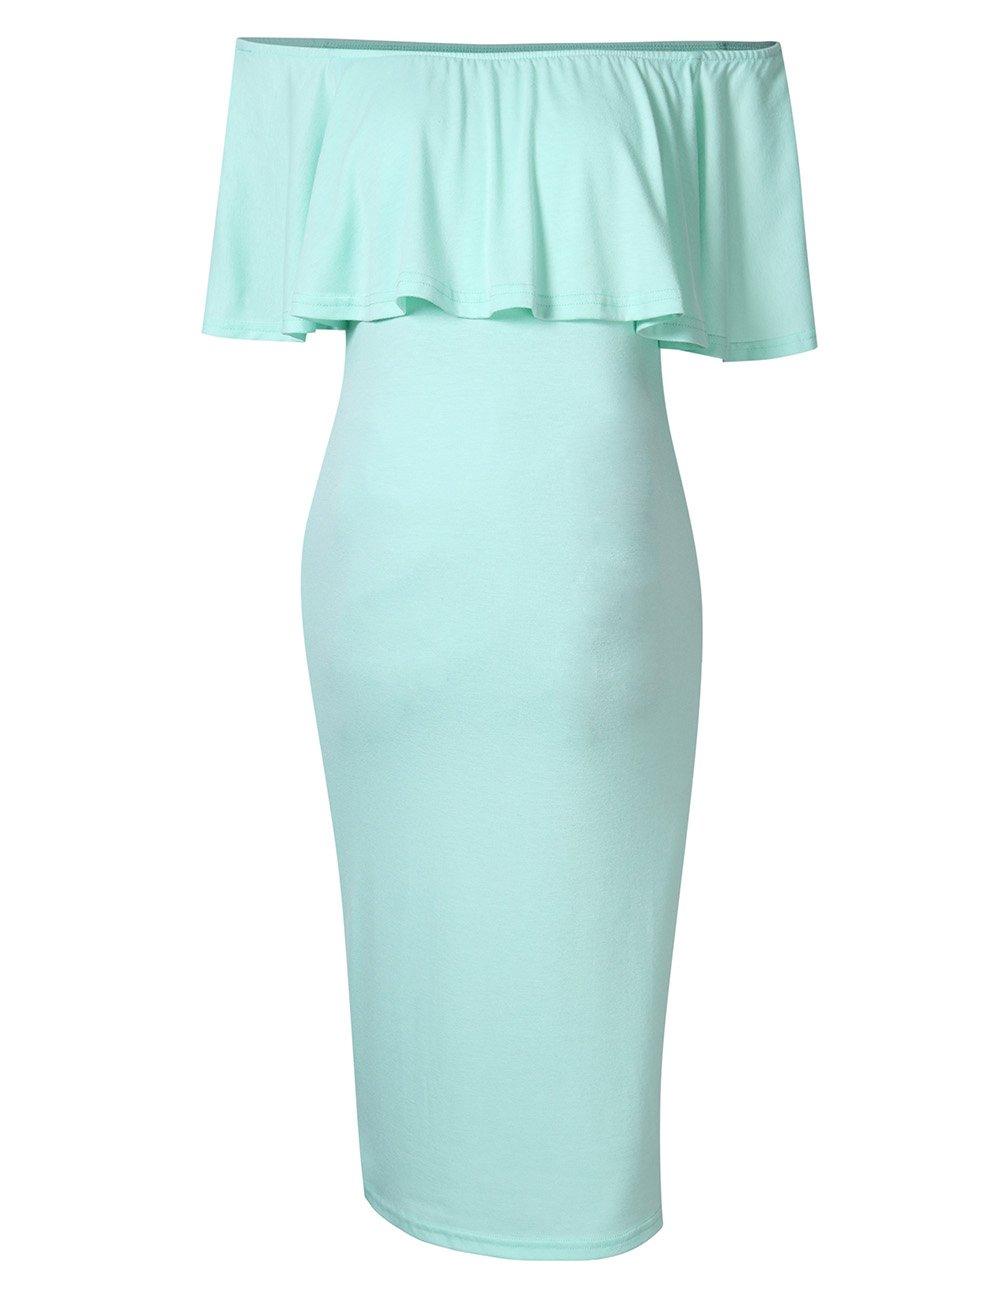 MissQee Women's Maternity Dress Off Shoulder Casual Maxi Dress LXT_01071LXT